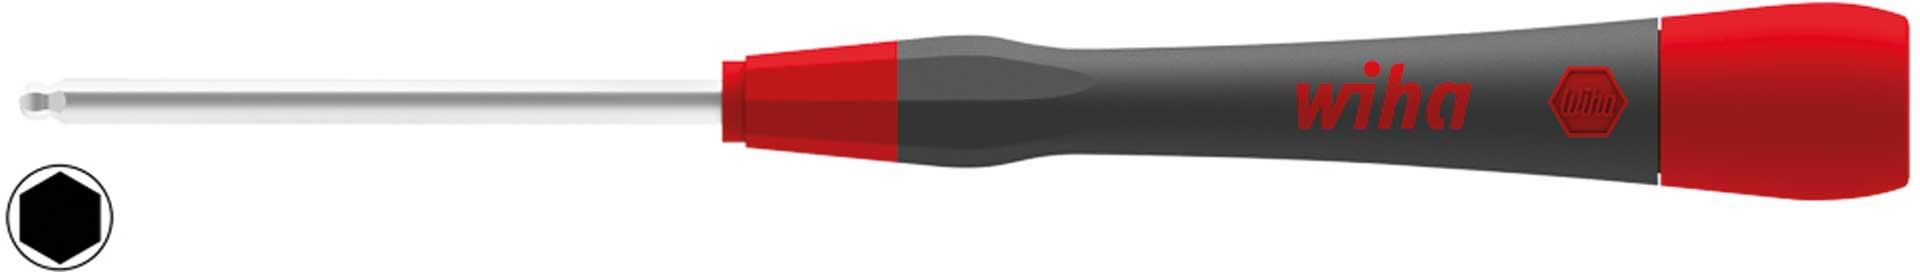 WIHA Kugelkopf Sechskant 2,5 x 60mm